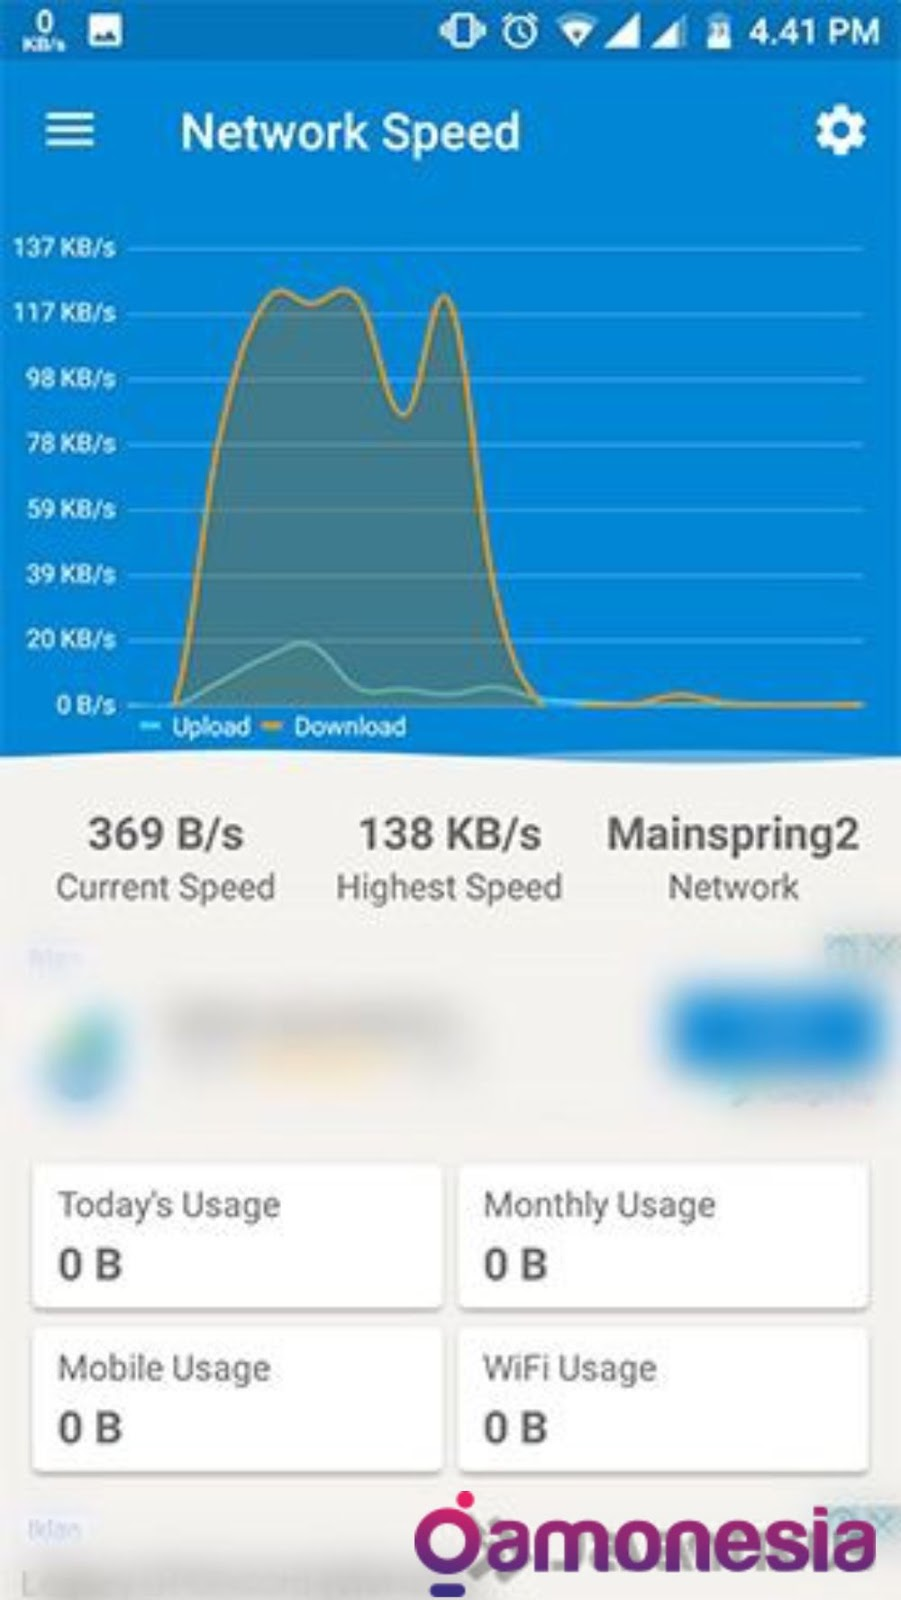 cara cek kecepatan internet android tanpa aplikasi